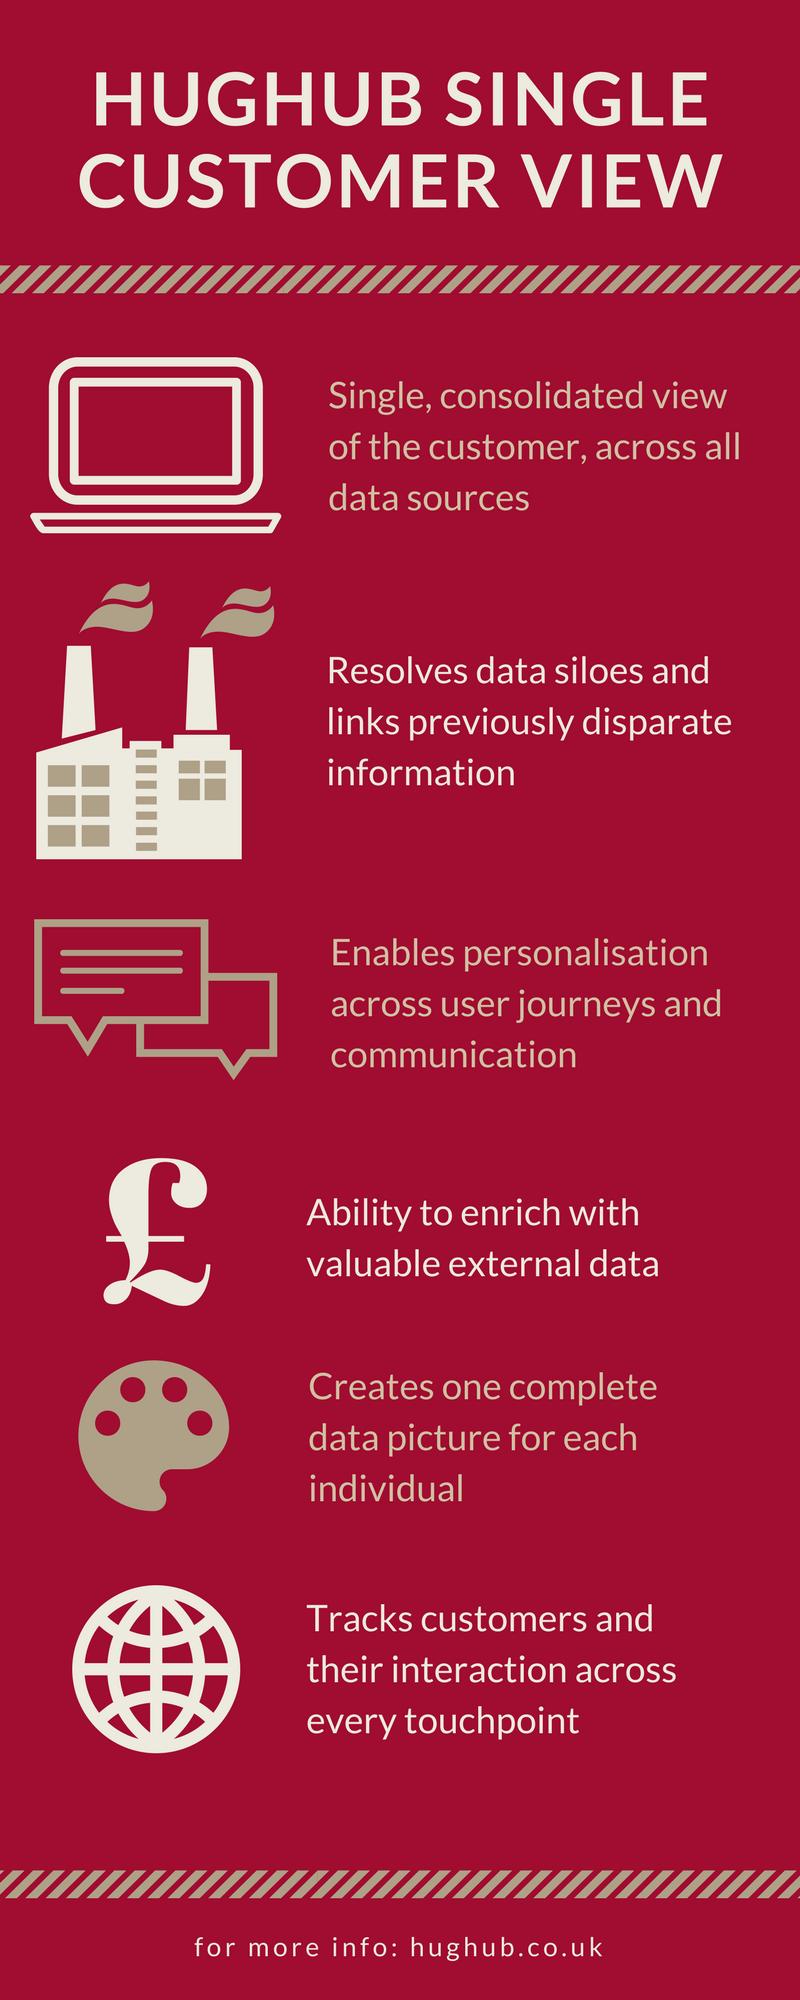 HUGHUB Single Customer View (SCV) Infographic